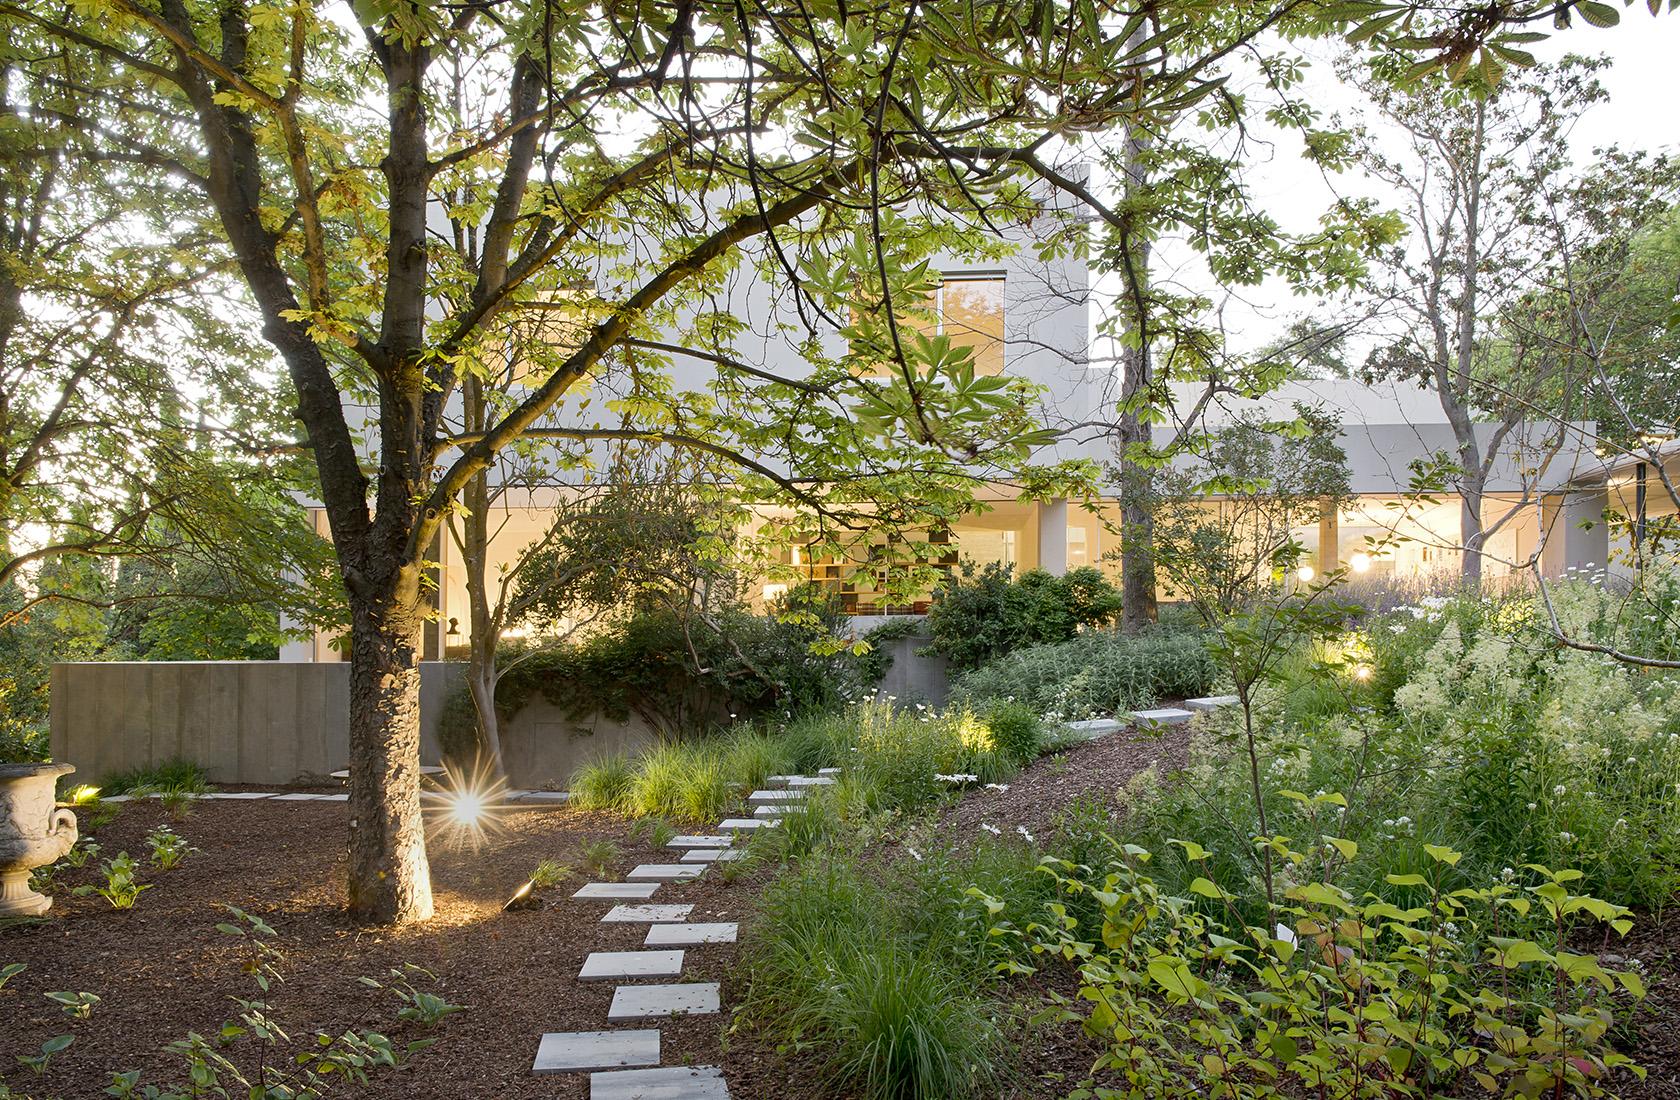 reforma-casa-l-paisajismo